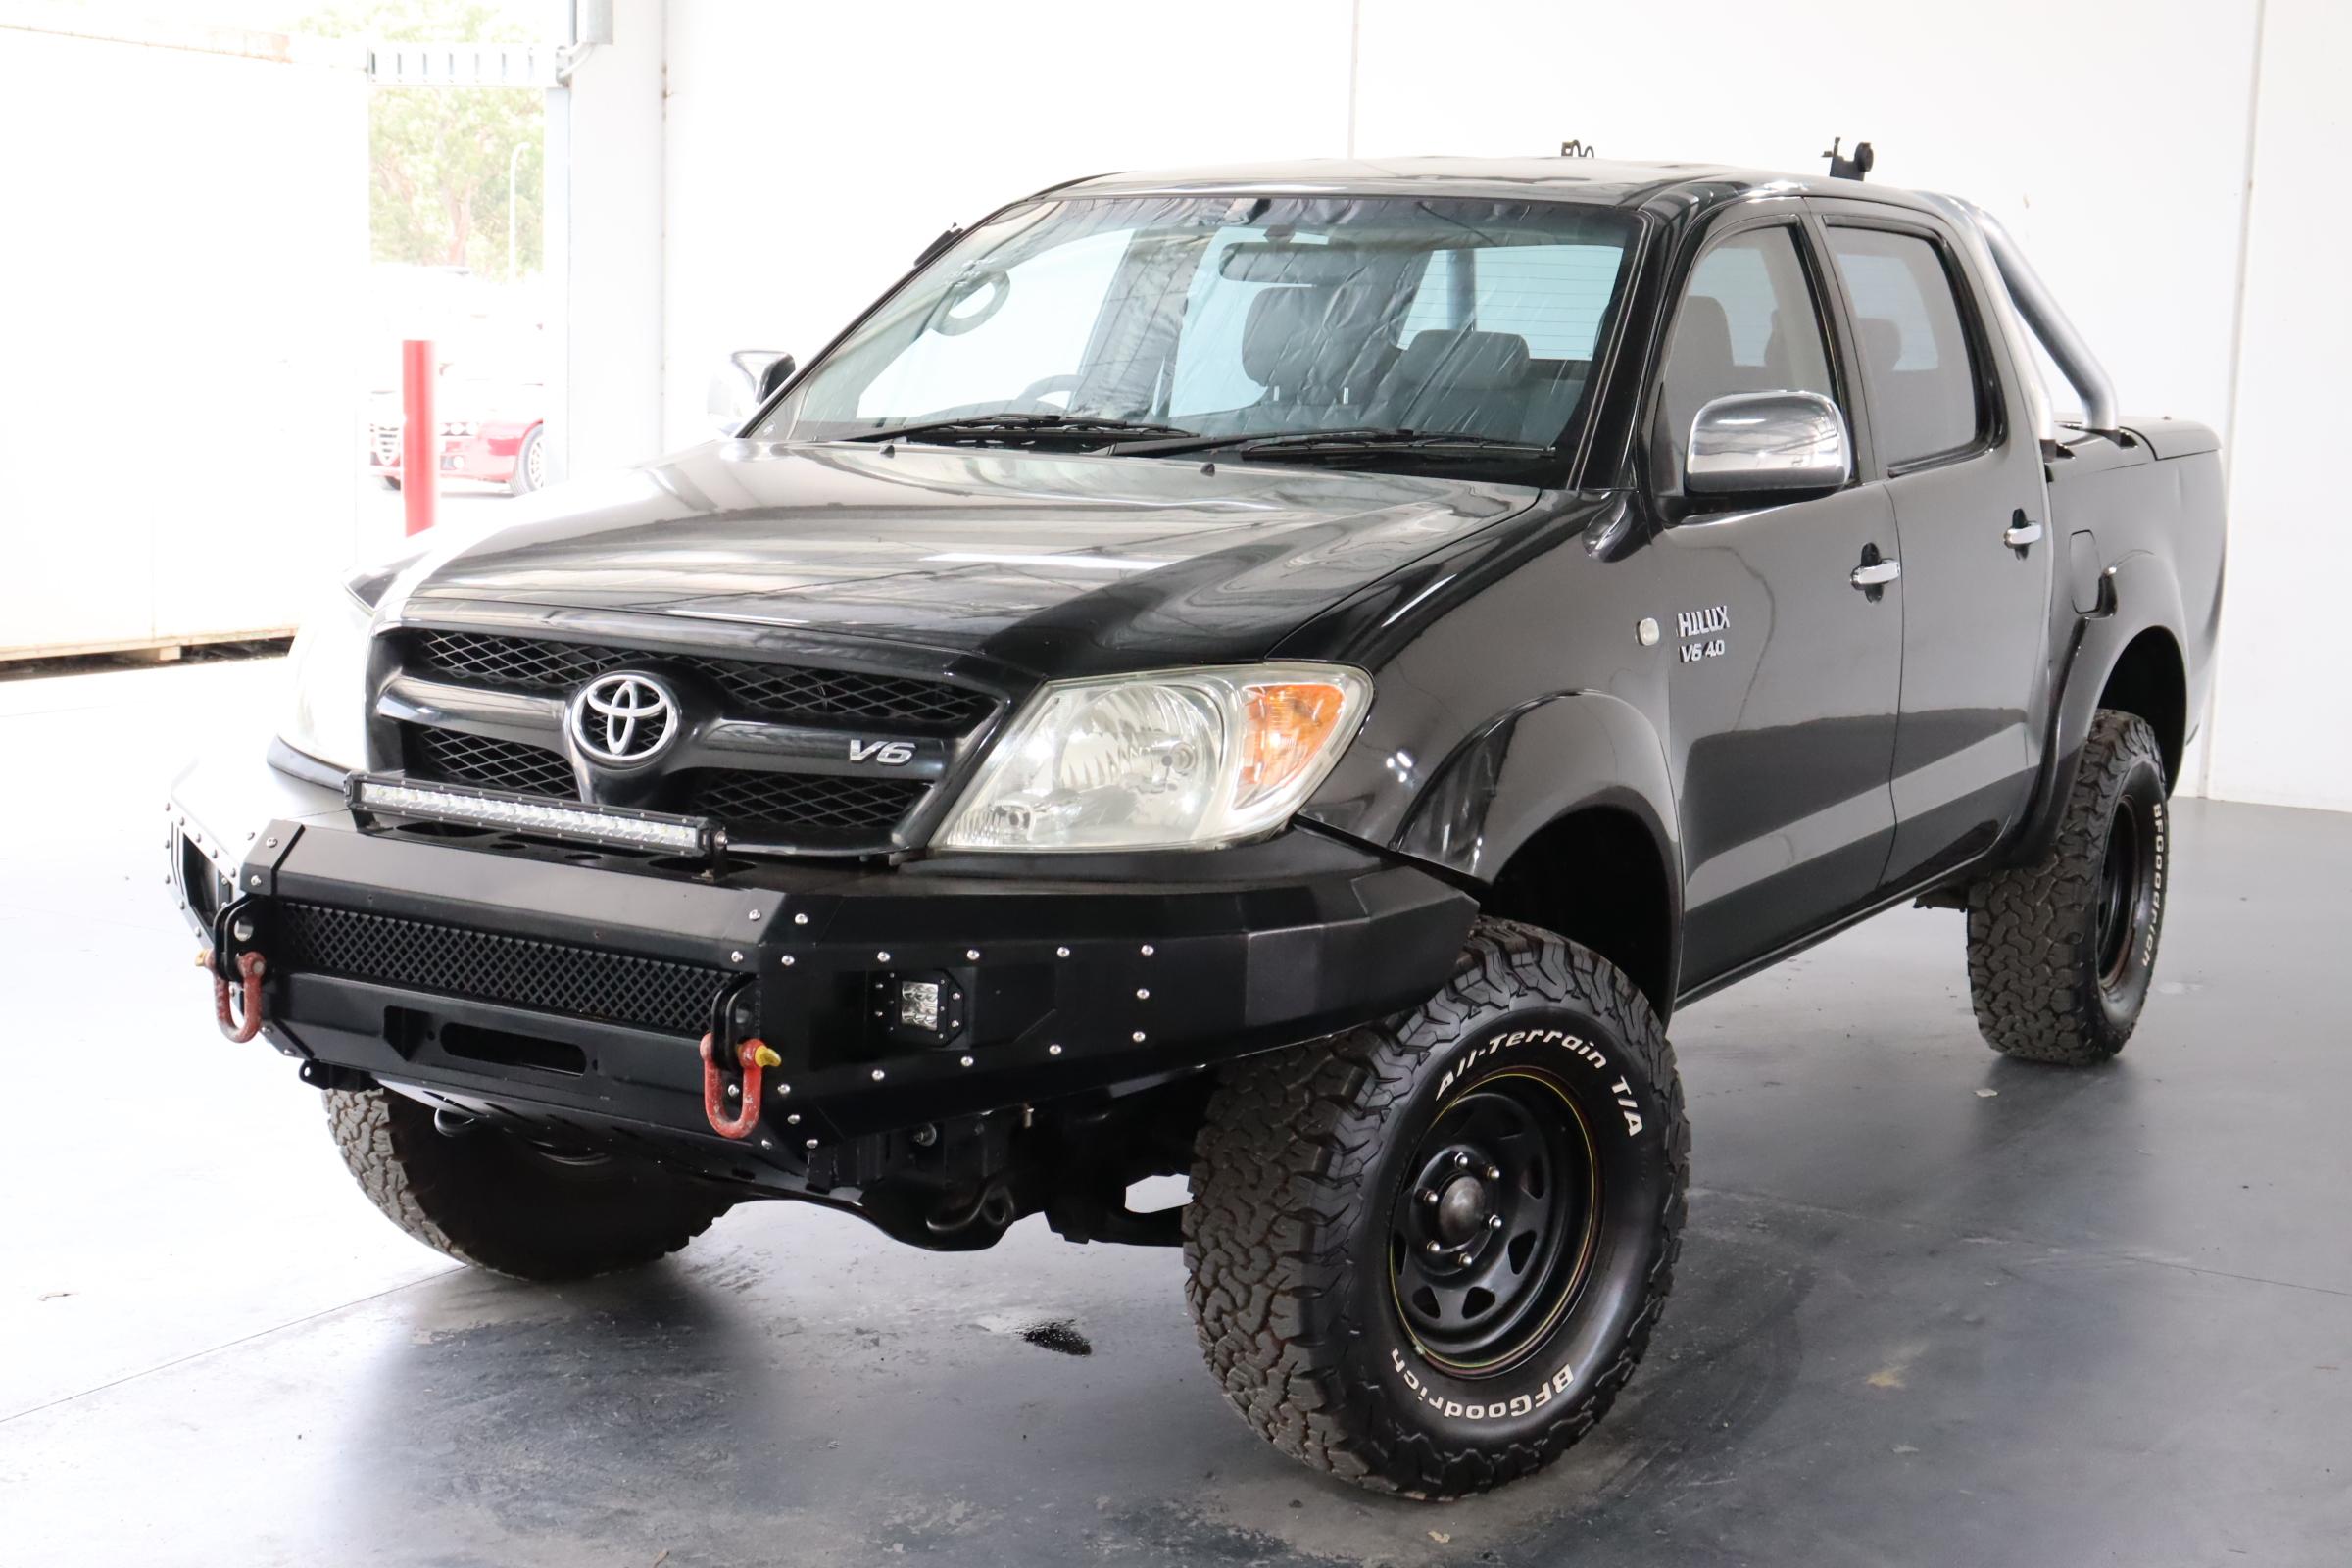 2007 Toyota Hilux SR5 (4x4) GGN25R Automatic Dual Cab